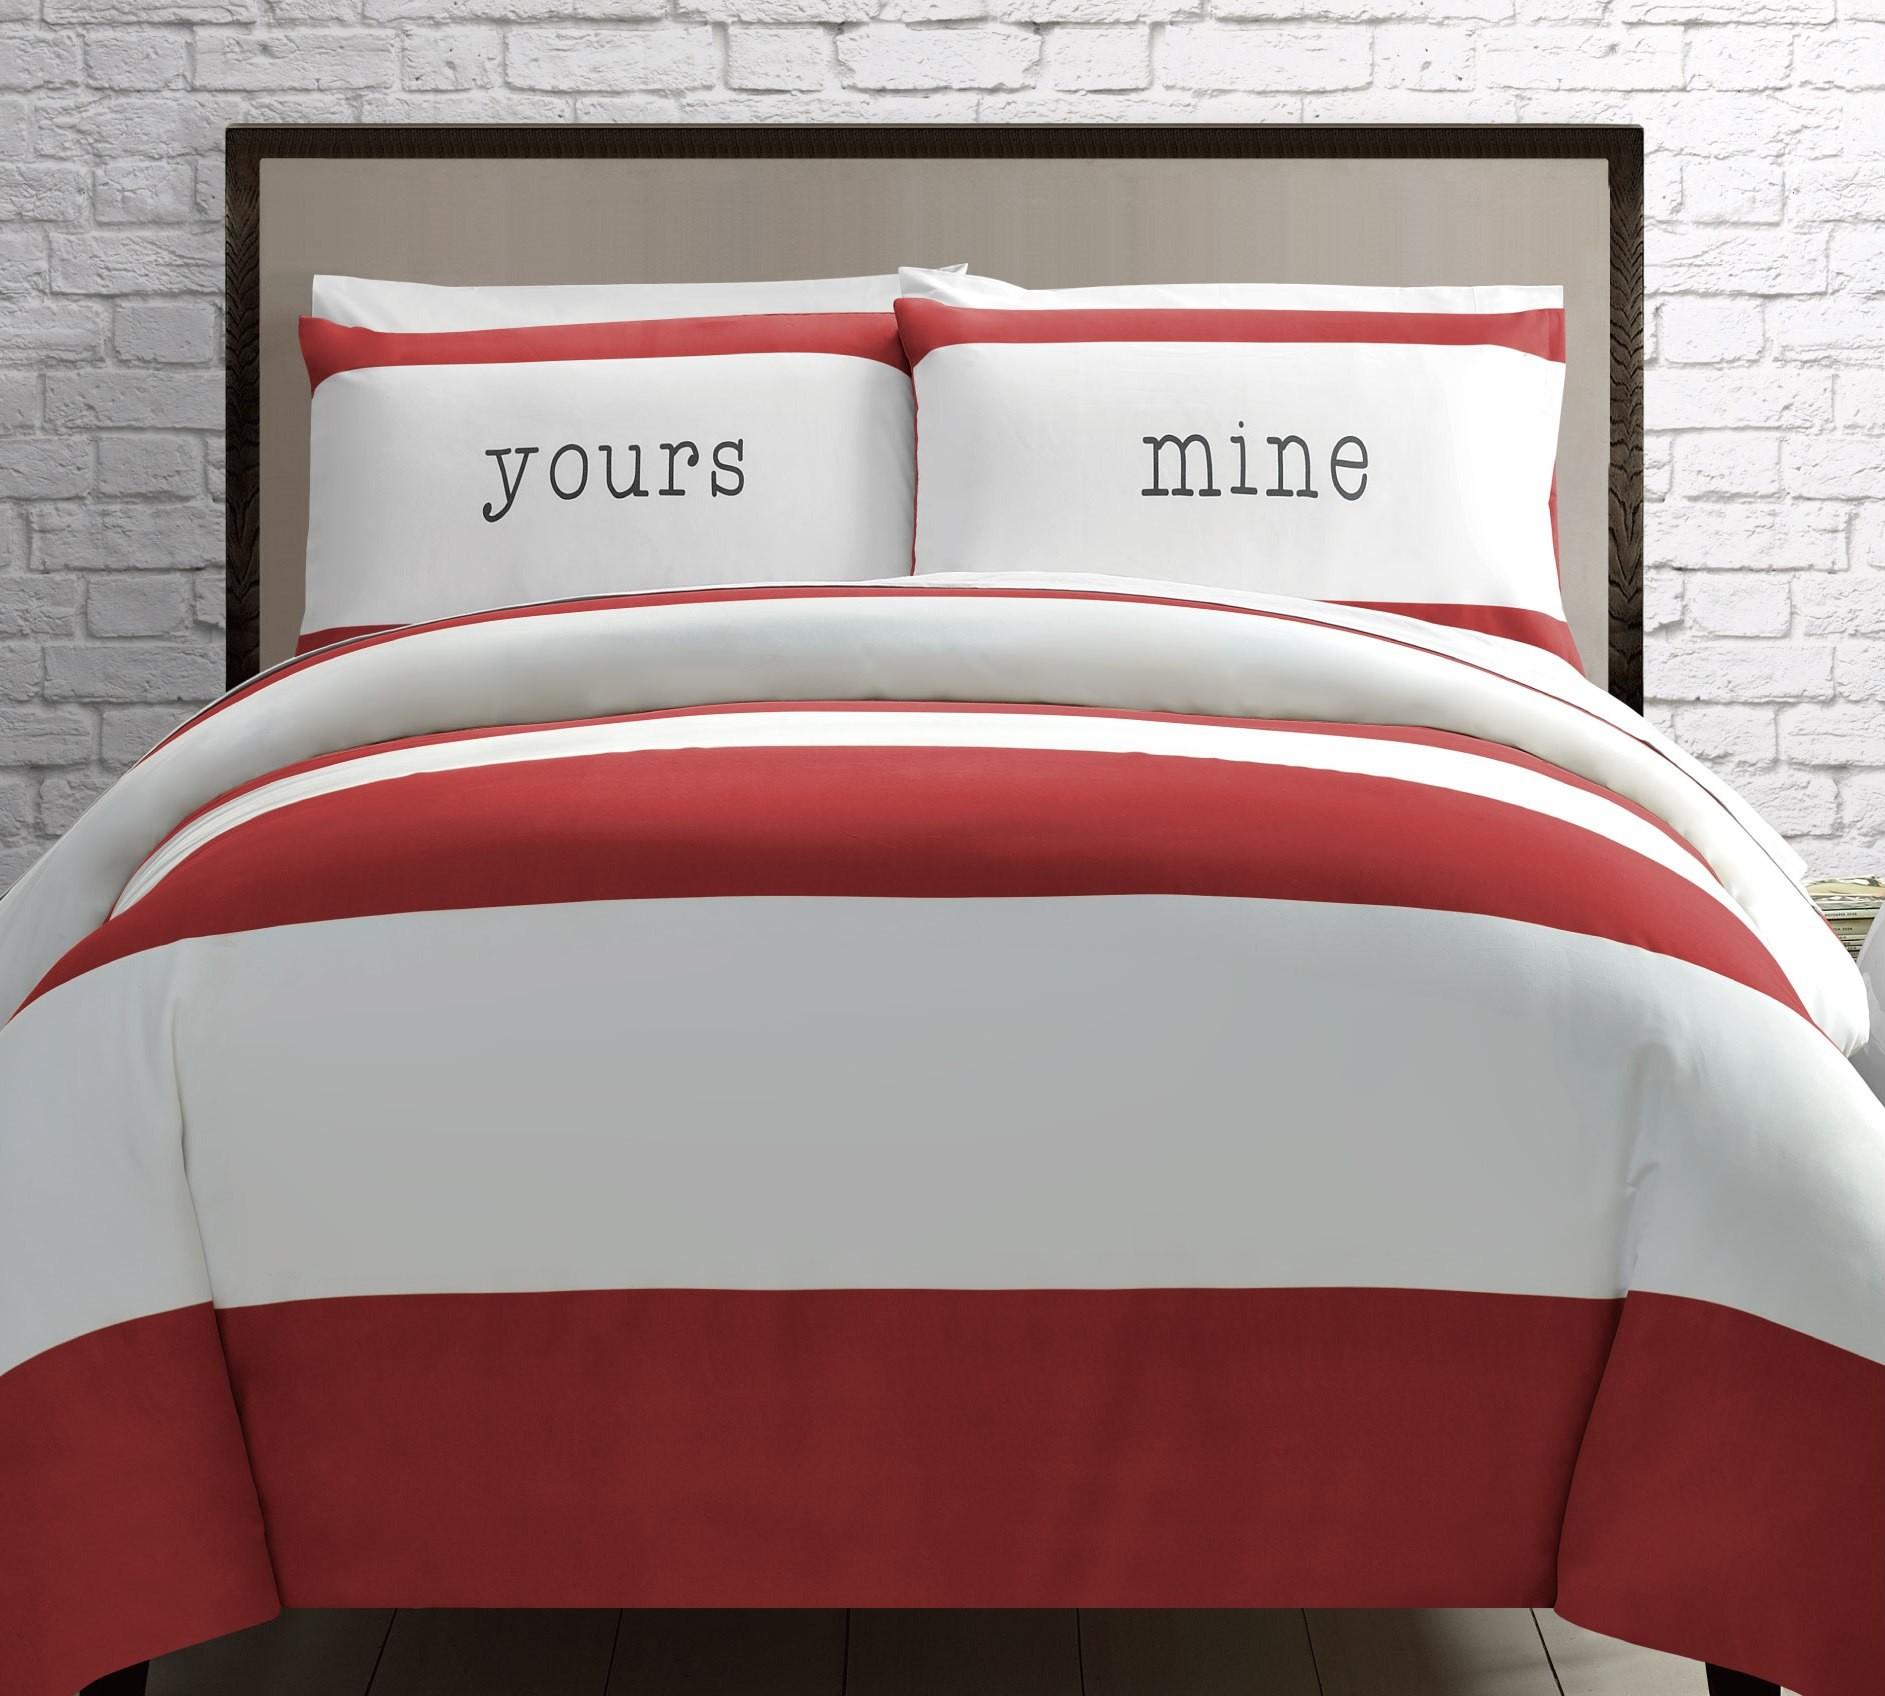 quilt bumper kitchen double black amazon fitted curtains cover red grandeur home set duvet sheet co dp bedding uk